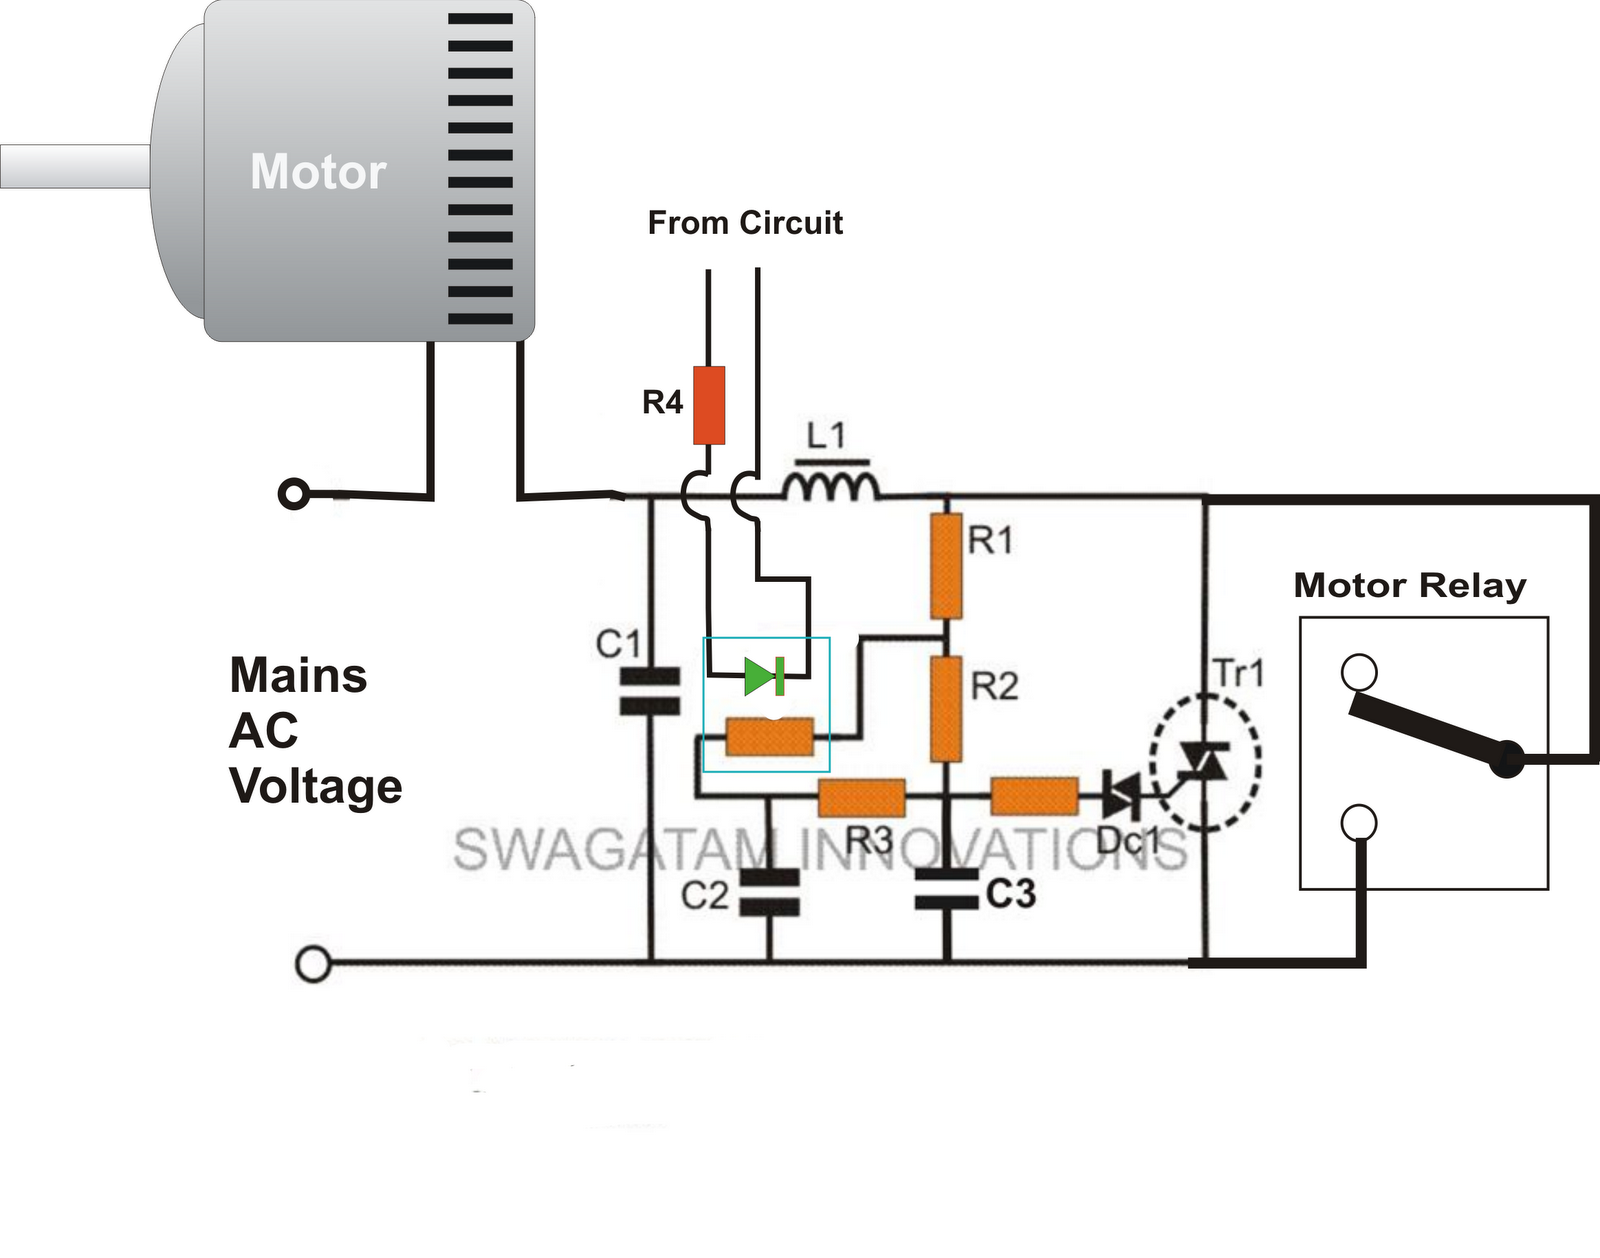 Abb Soft Starter Wiring Diagram Adding A Soft Start To Water Pump Motors Reducing Relay